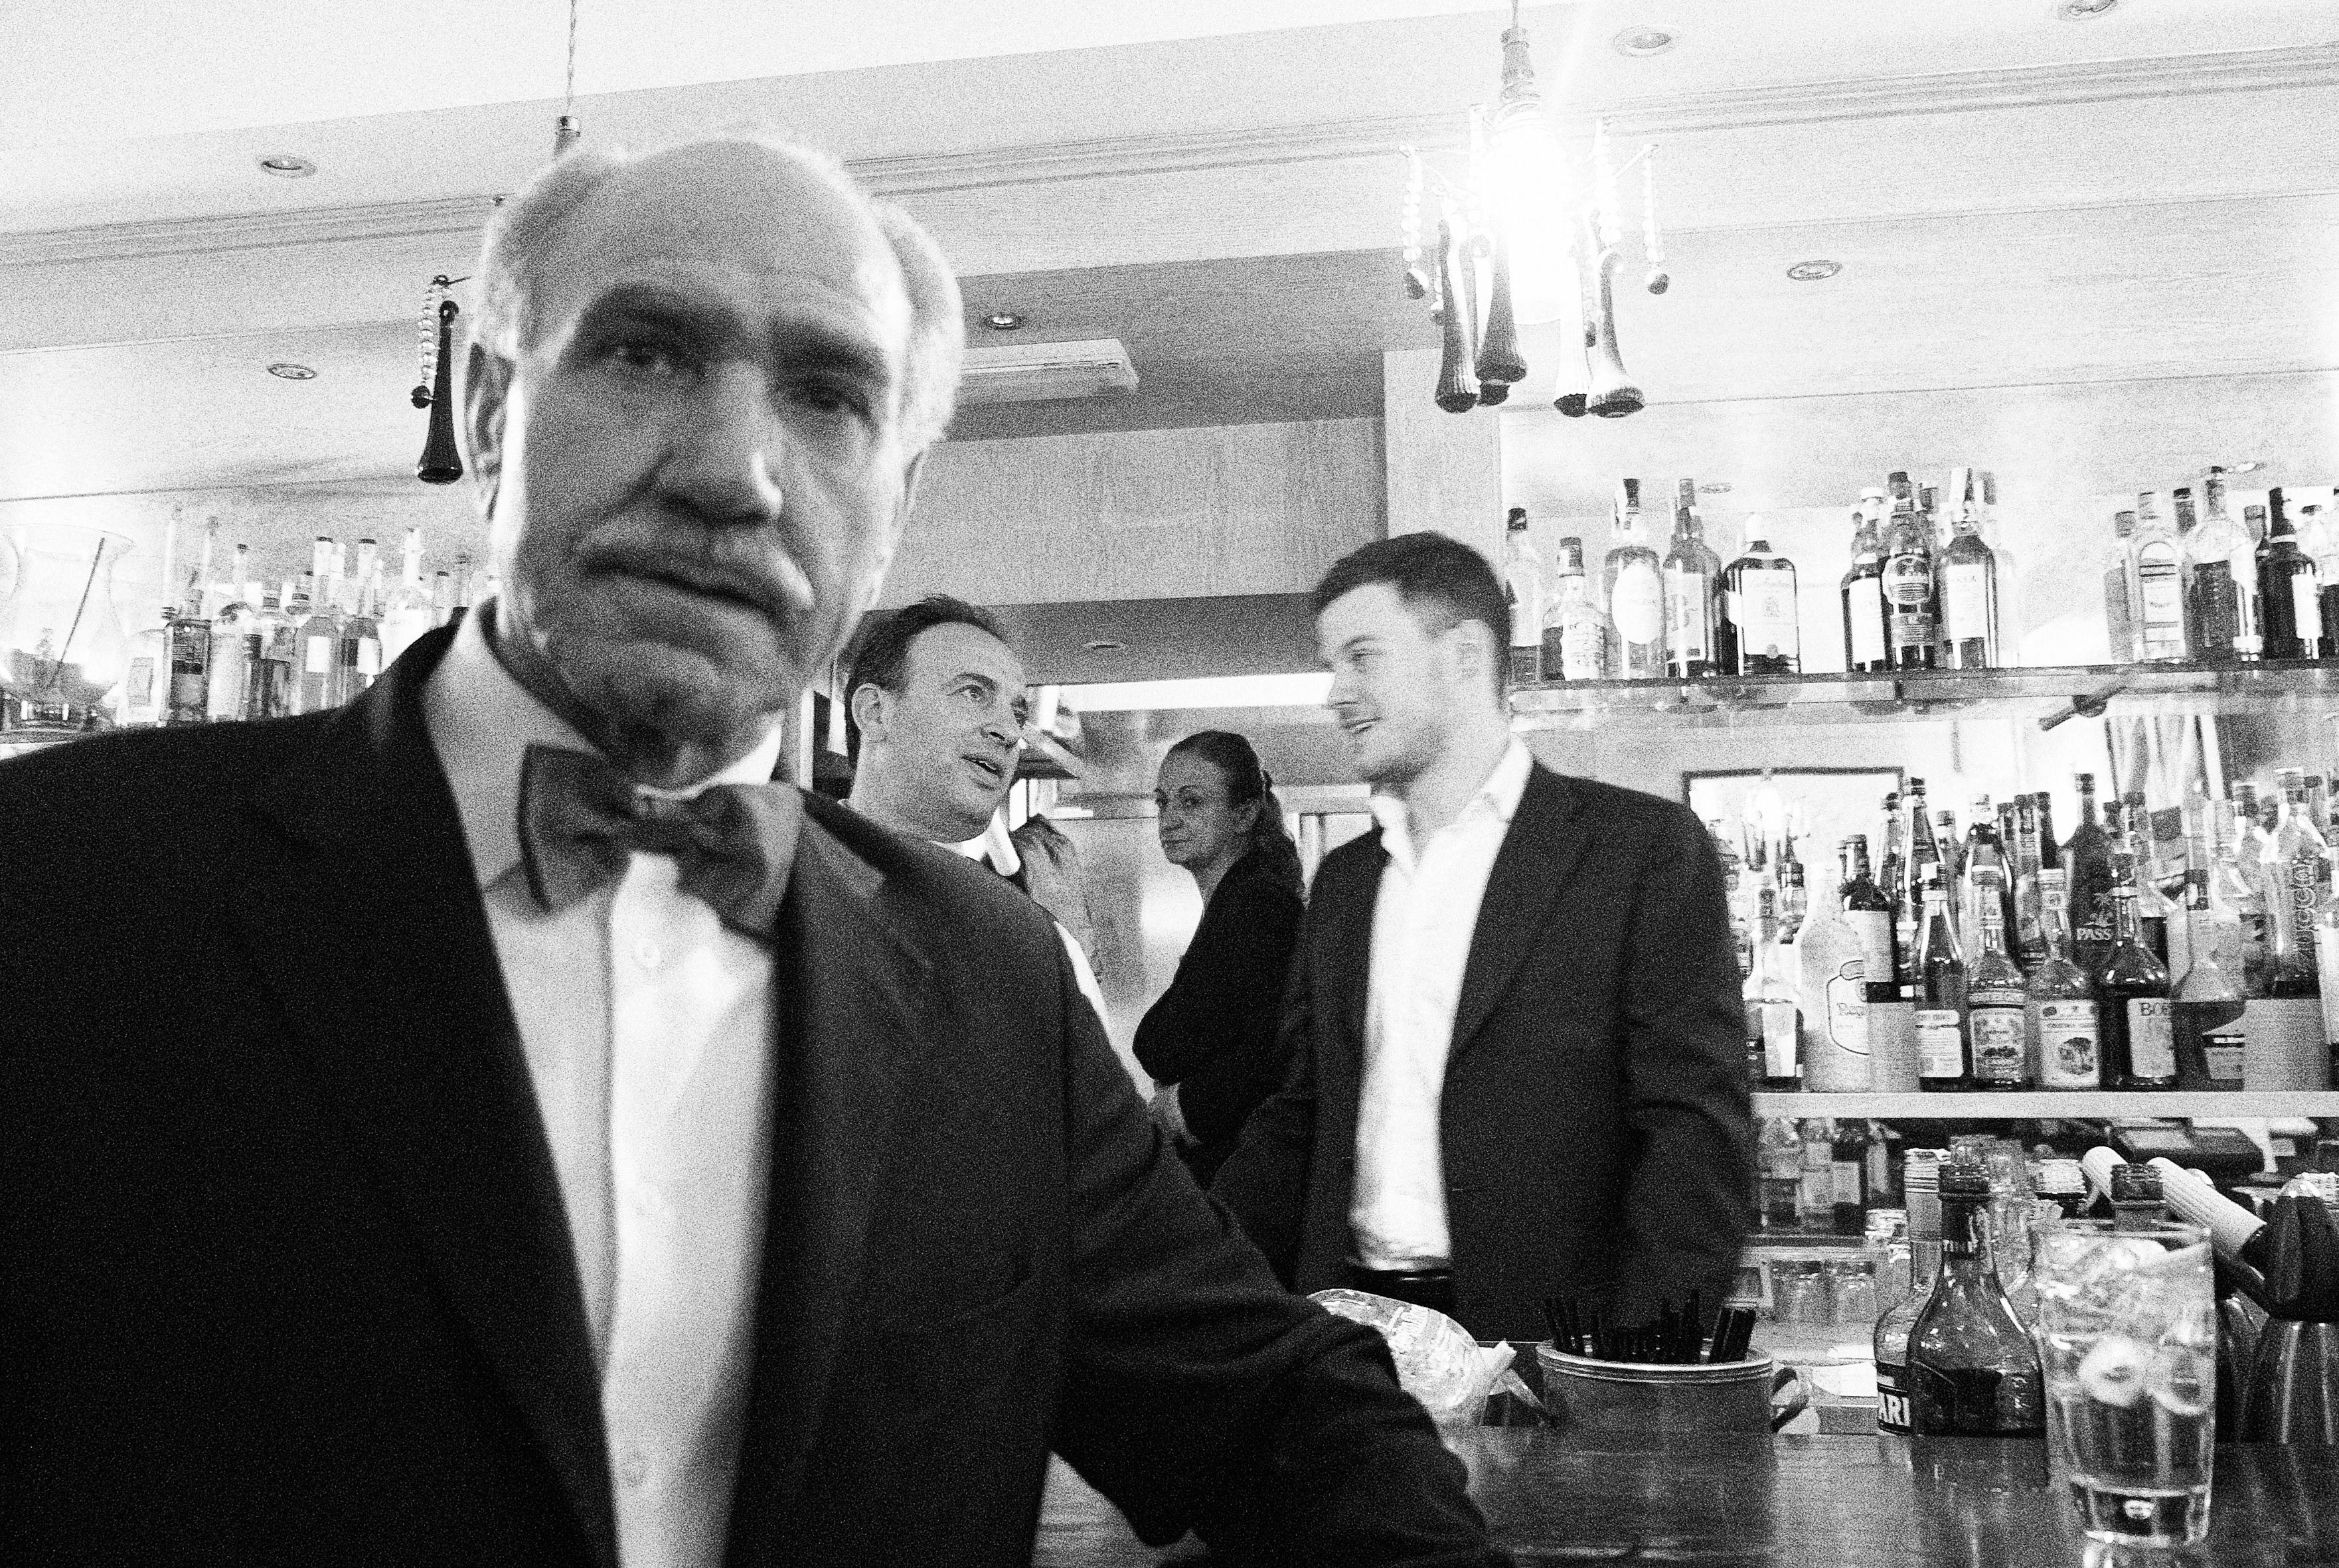 Wine bar Camponeschi staff - Roma